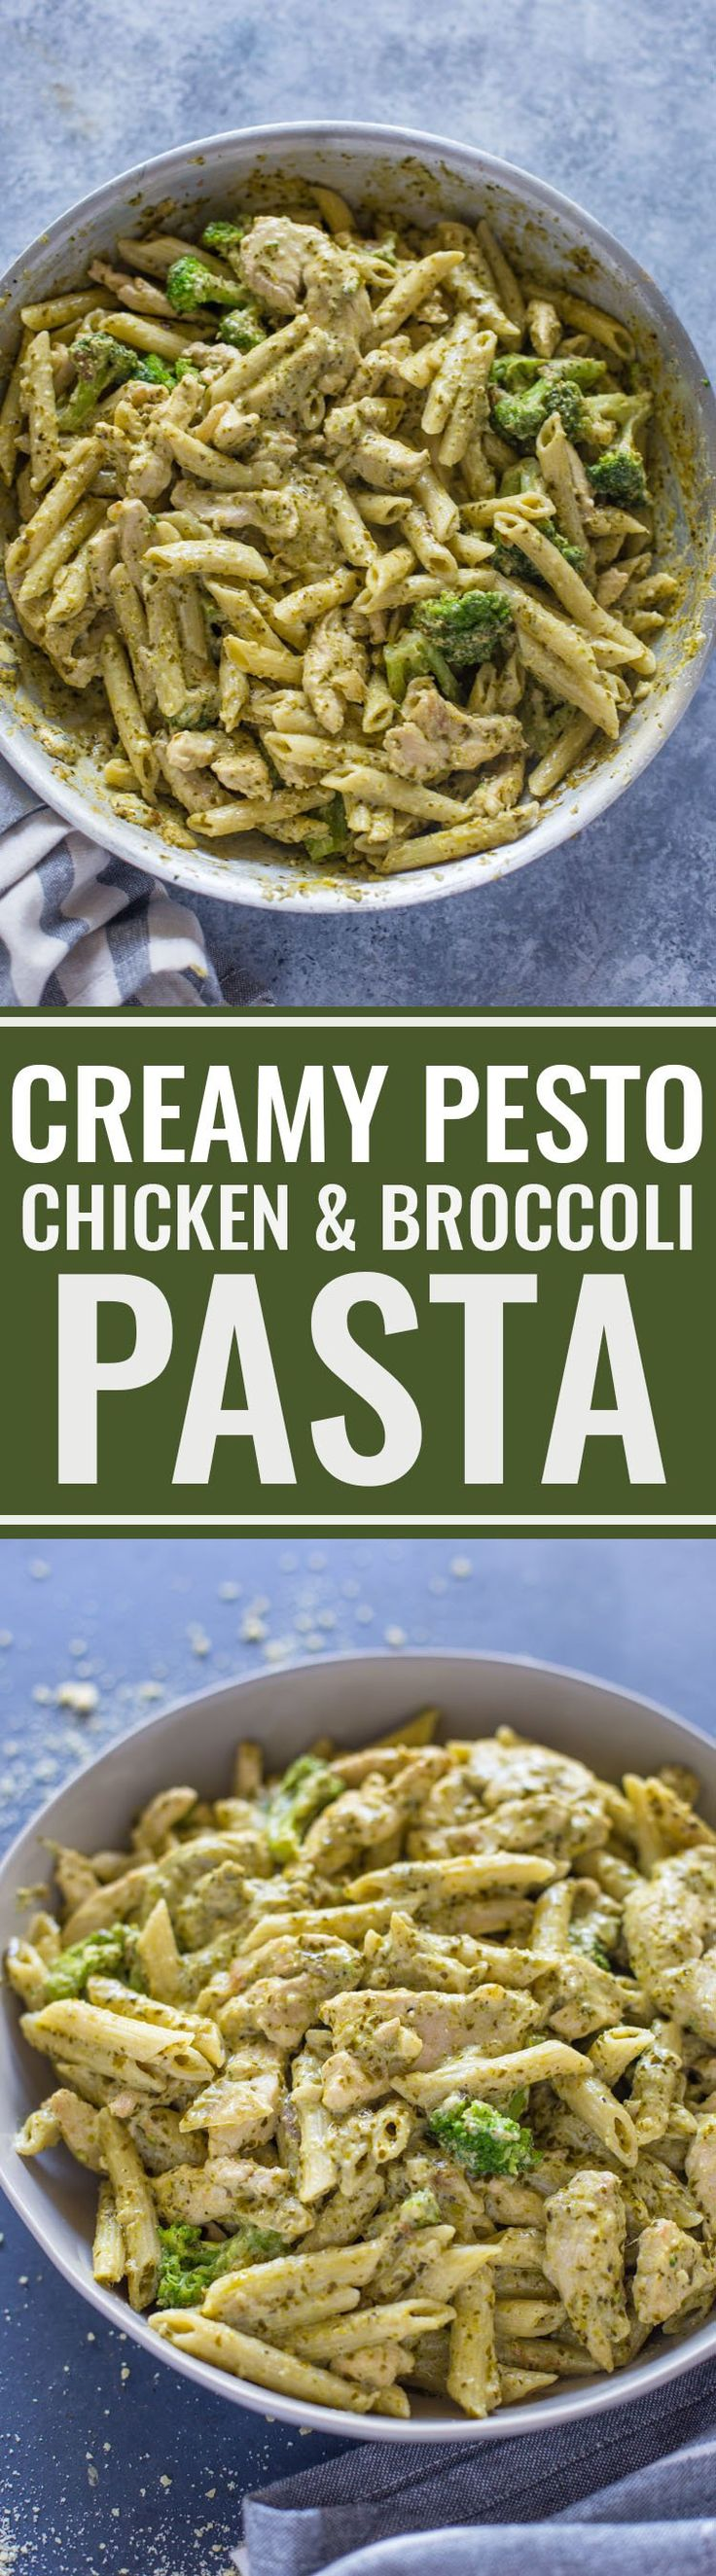 Kip, pesto, broccoli pasta.